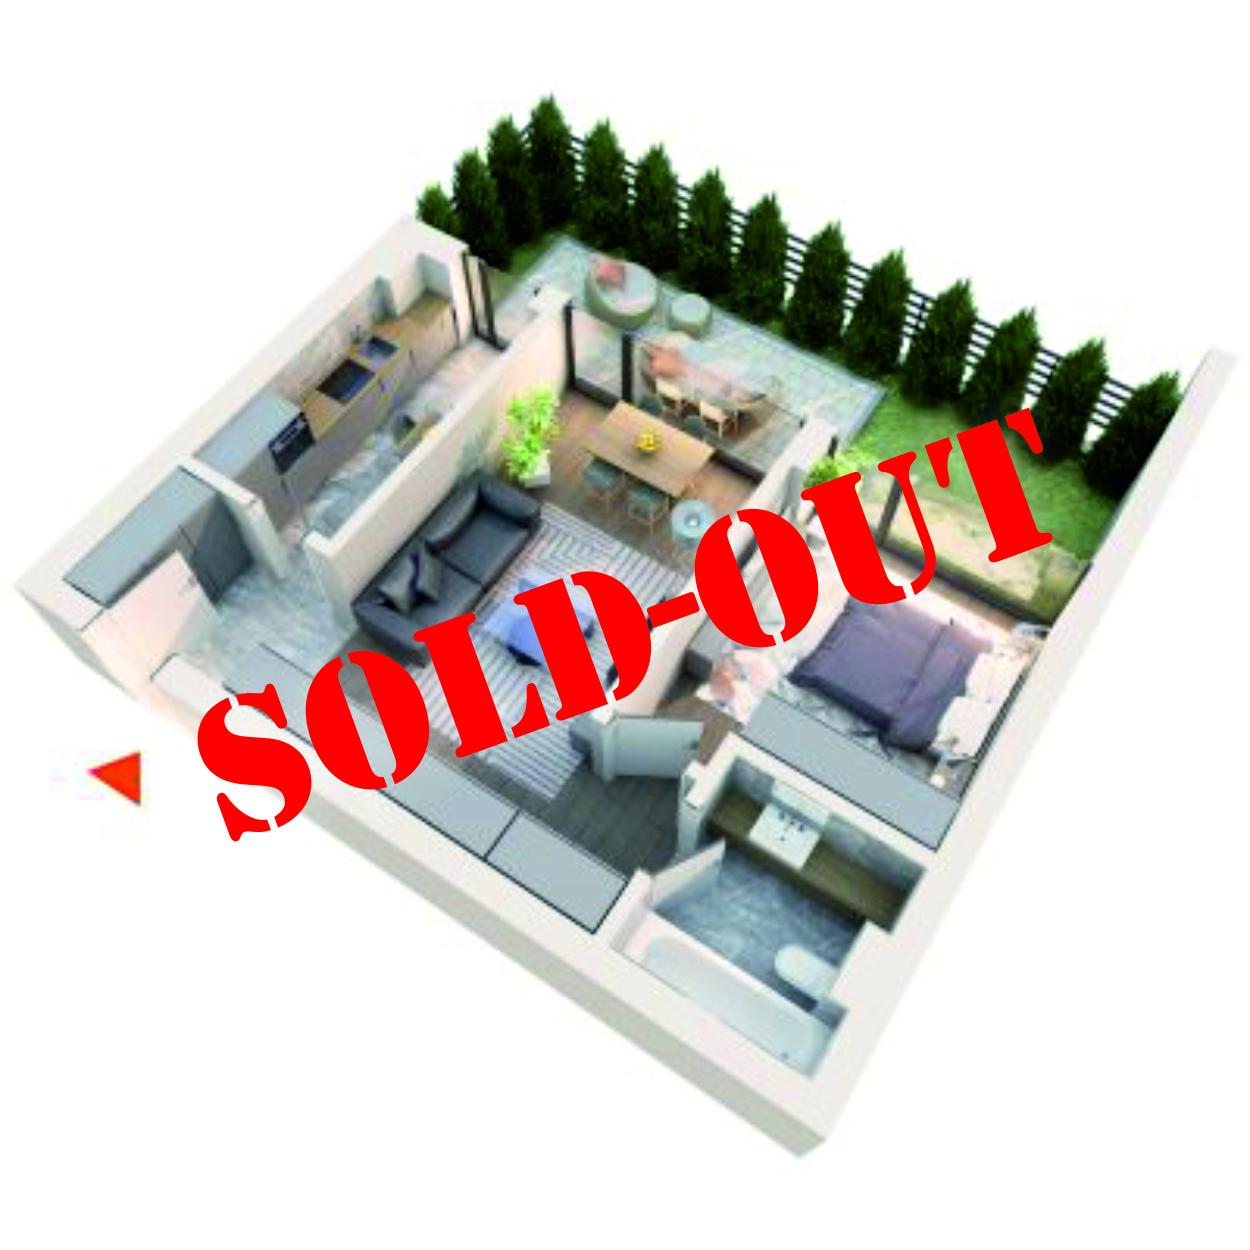 Apartament 2 camere tip 2A3 gradina | Parter | Corp C3, C4 | Faza 2